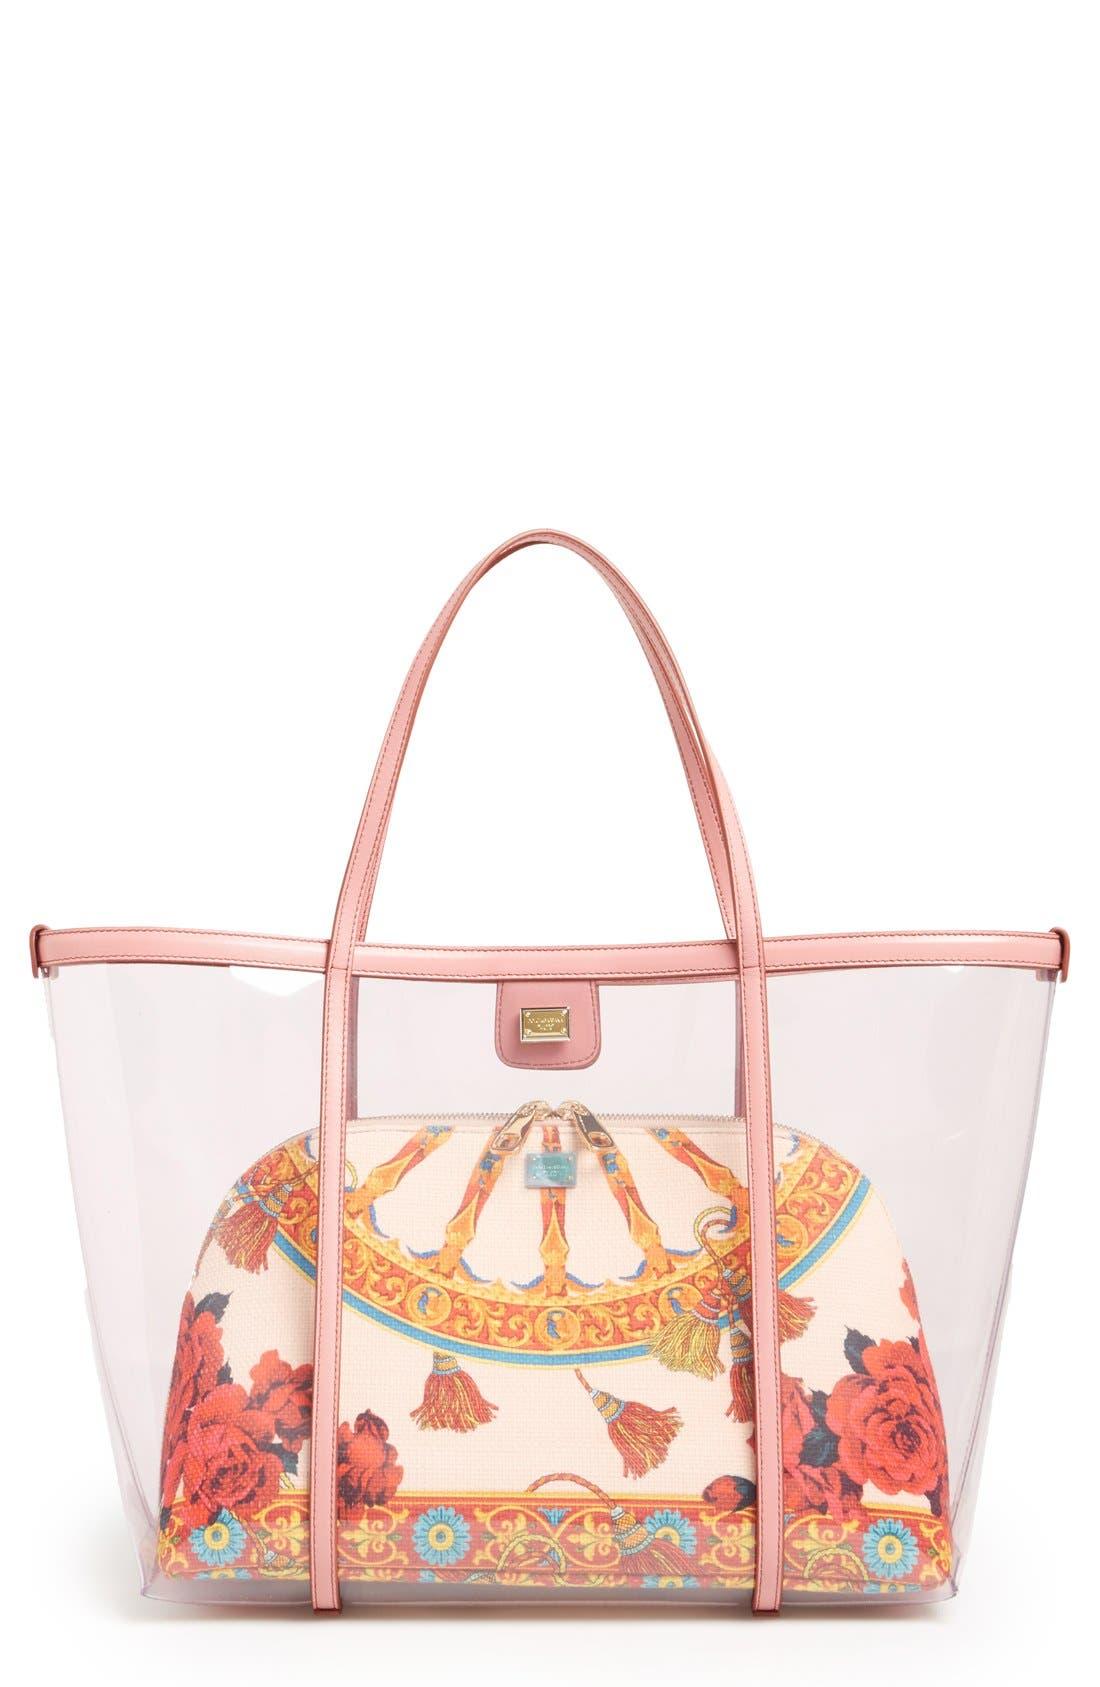 Main Image - Dolce&Gabbana 'Miss Escape' Clear Tote